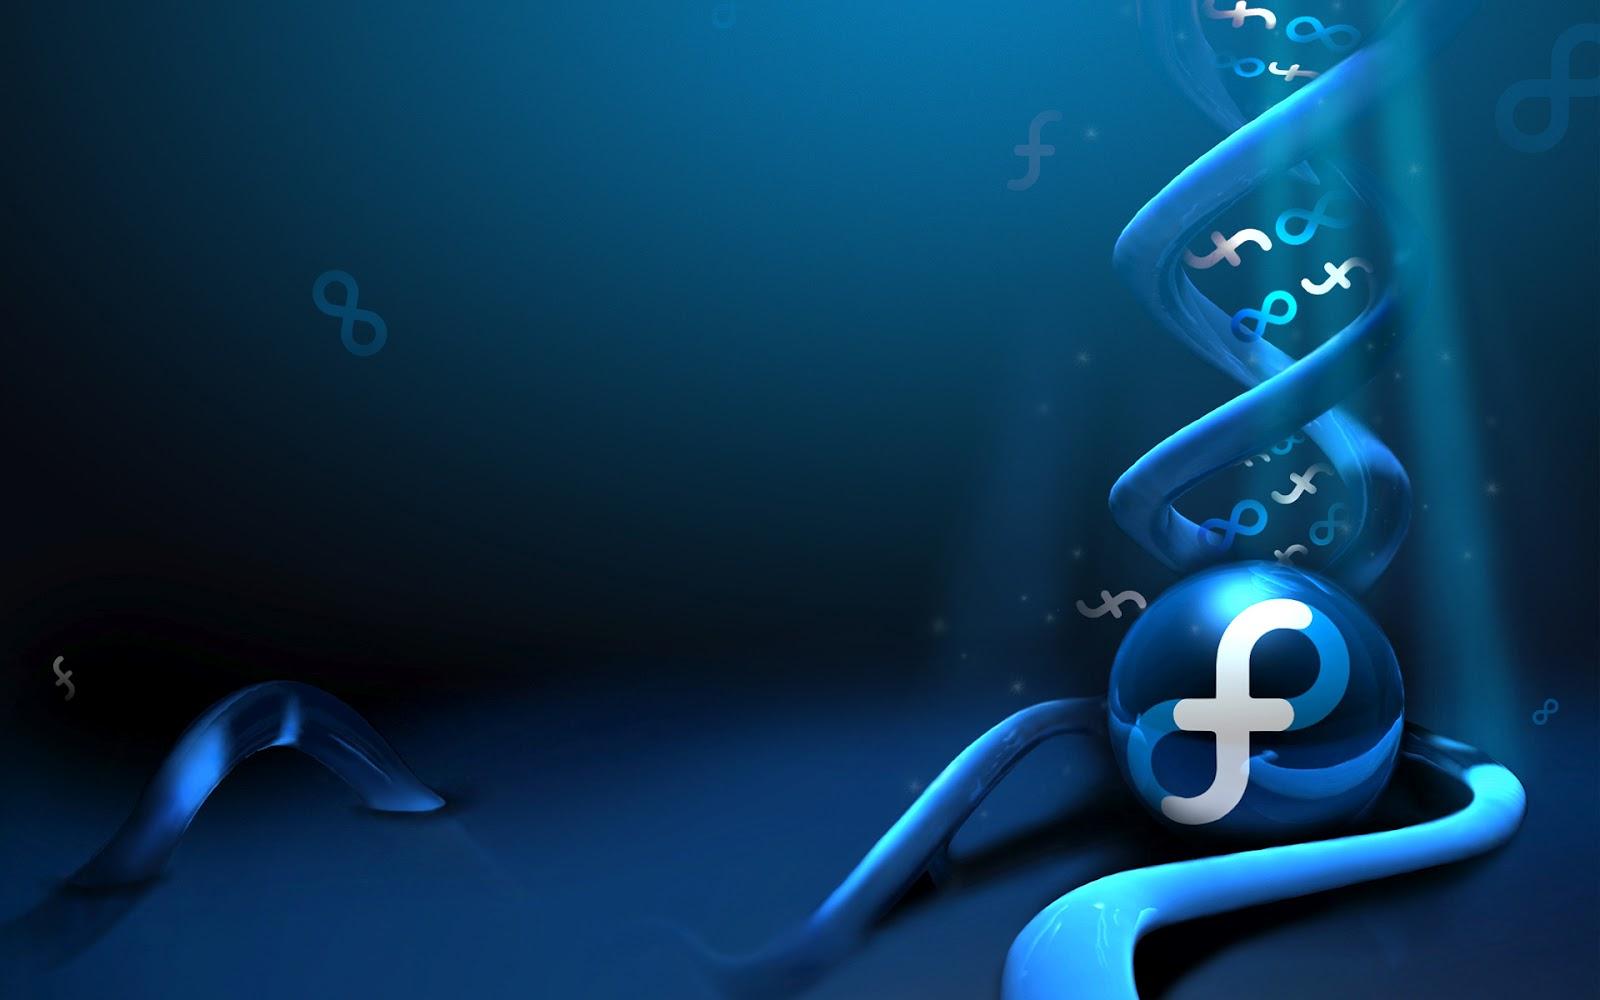 http://3.bp.blogspot.com/-YU332AC2GDE/T2hoOIWr88I/AAAAAAAACvk/q560F8kmfJ4/s1600/Fedora+Wallpaper+1.jpg